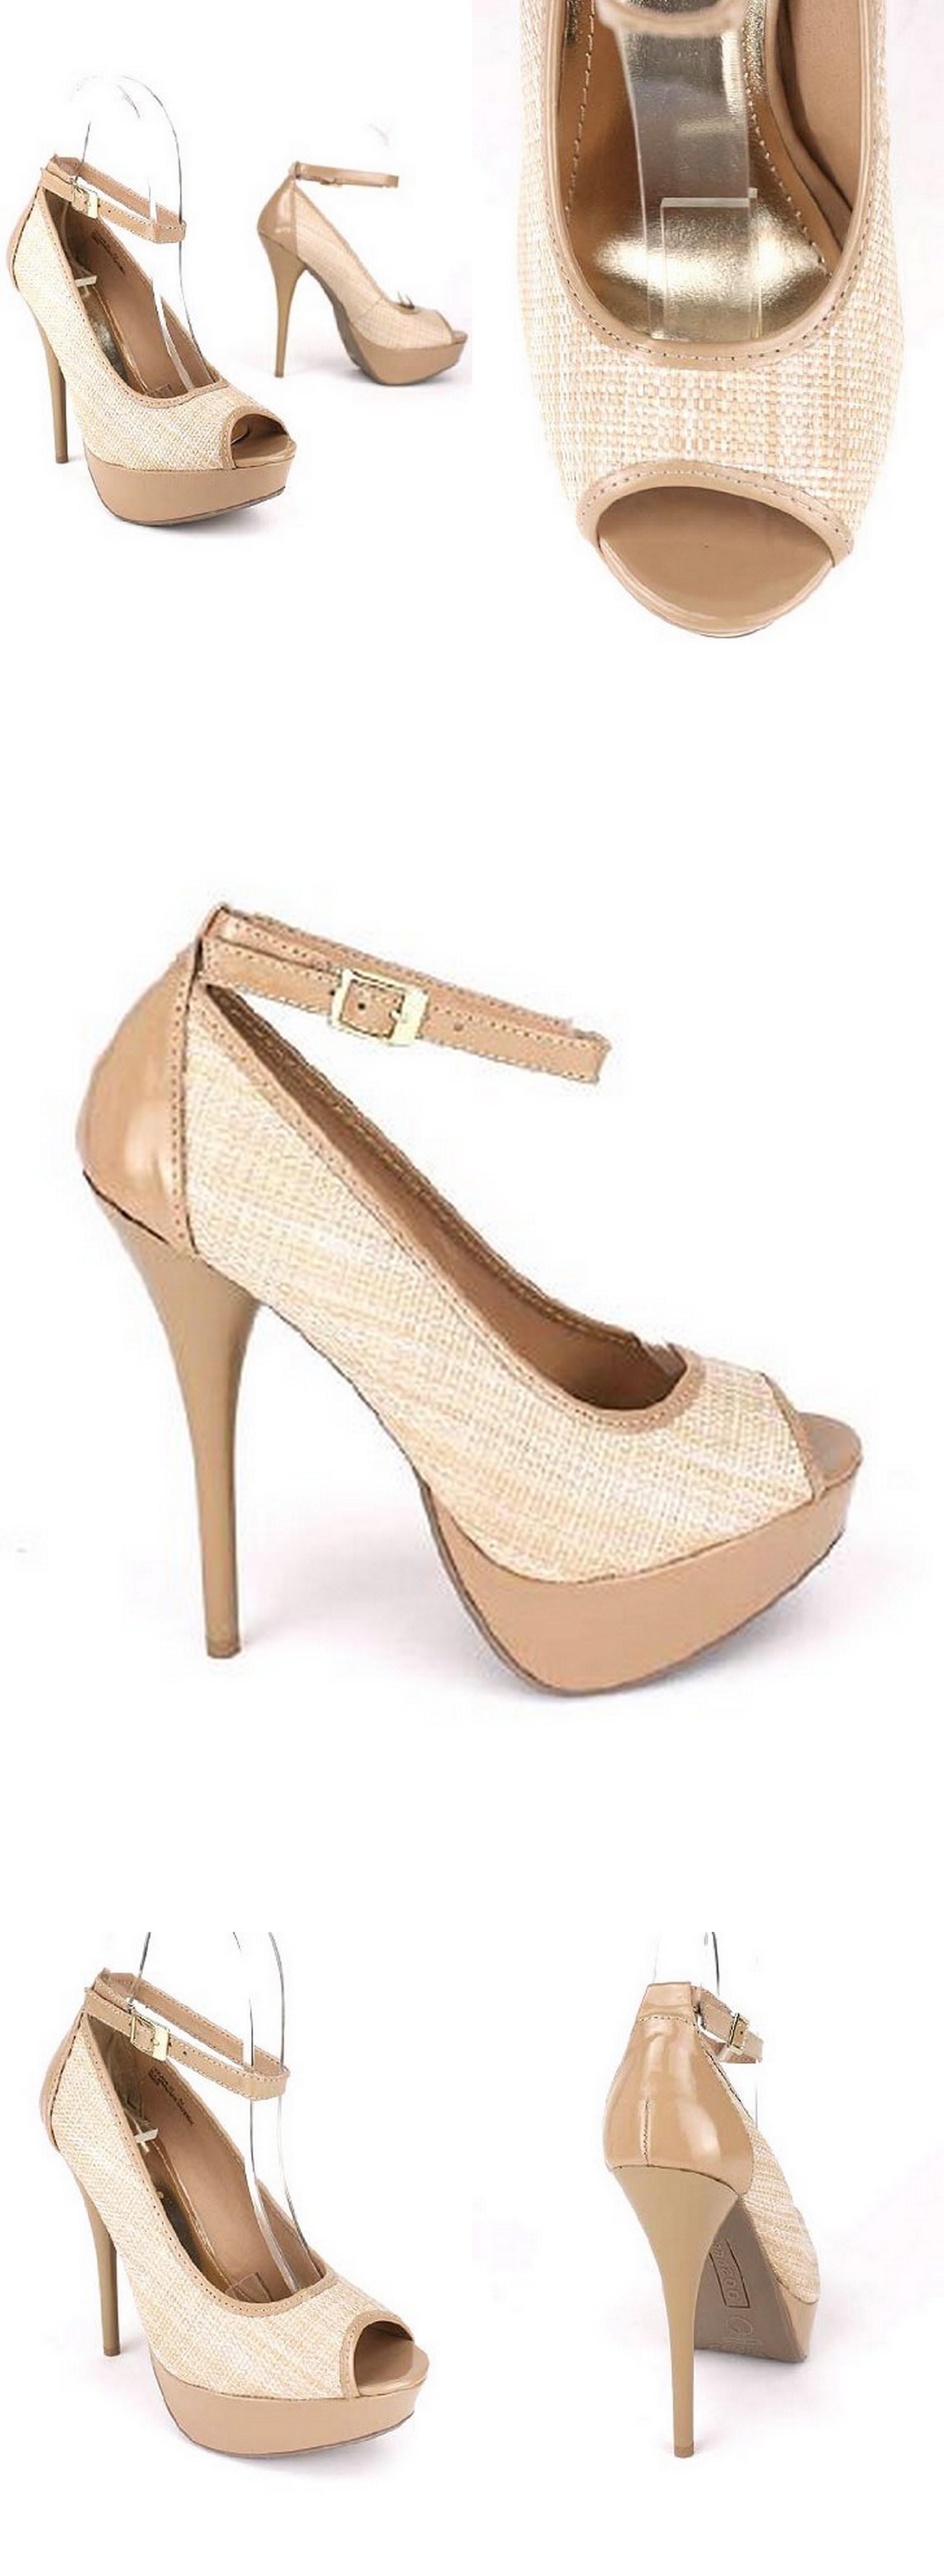 Bamboo Raffia peep toe pump shoe.jpg